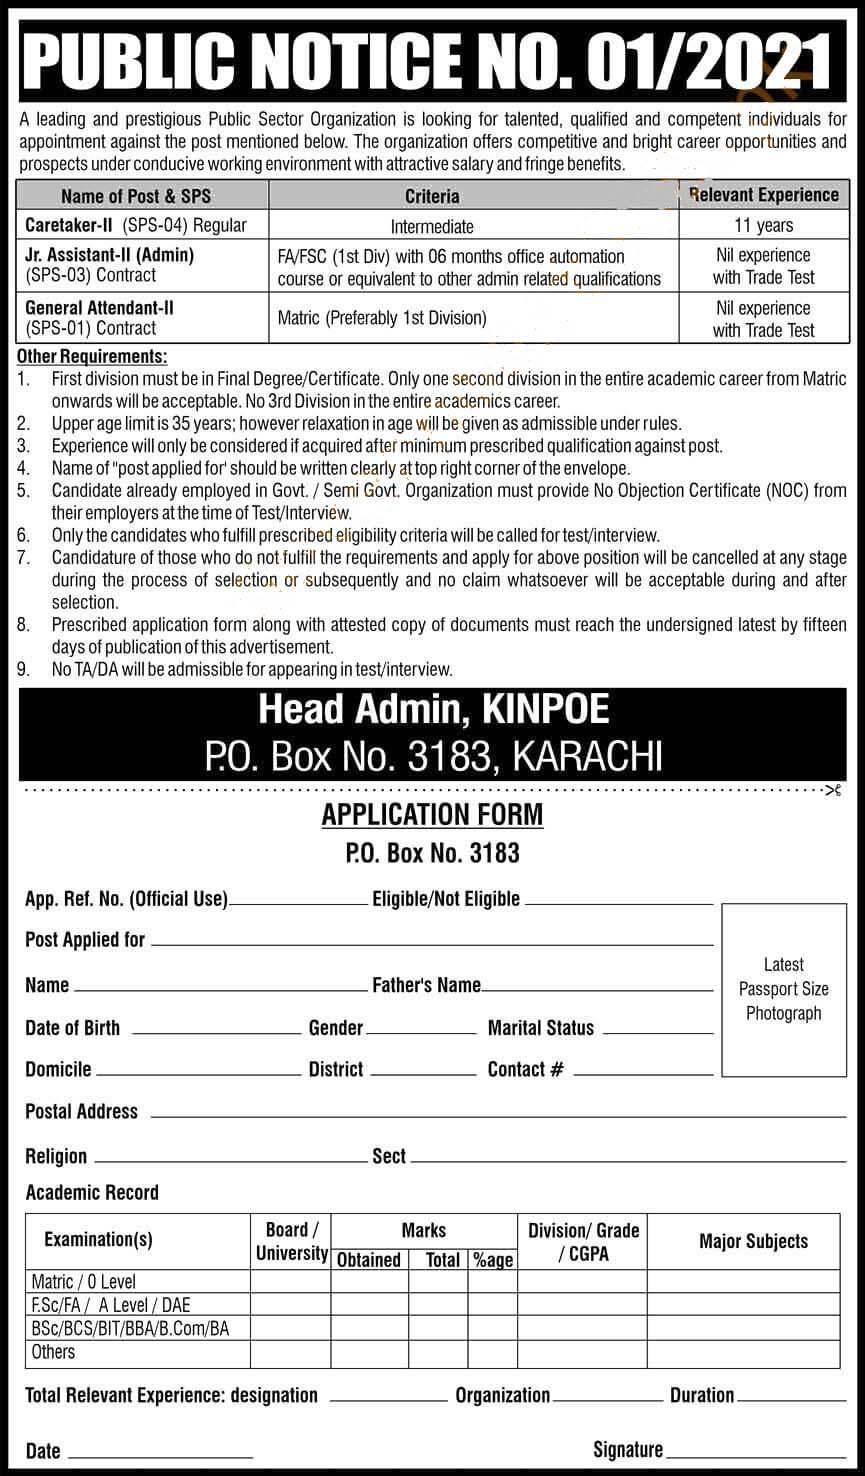 New Jobs in Public Sector Organization PN No. 012021  Jobs Pakistan Atomic Energy Commission (PAEC) Karachi by www.newjobs.pk